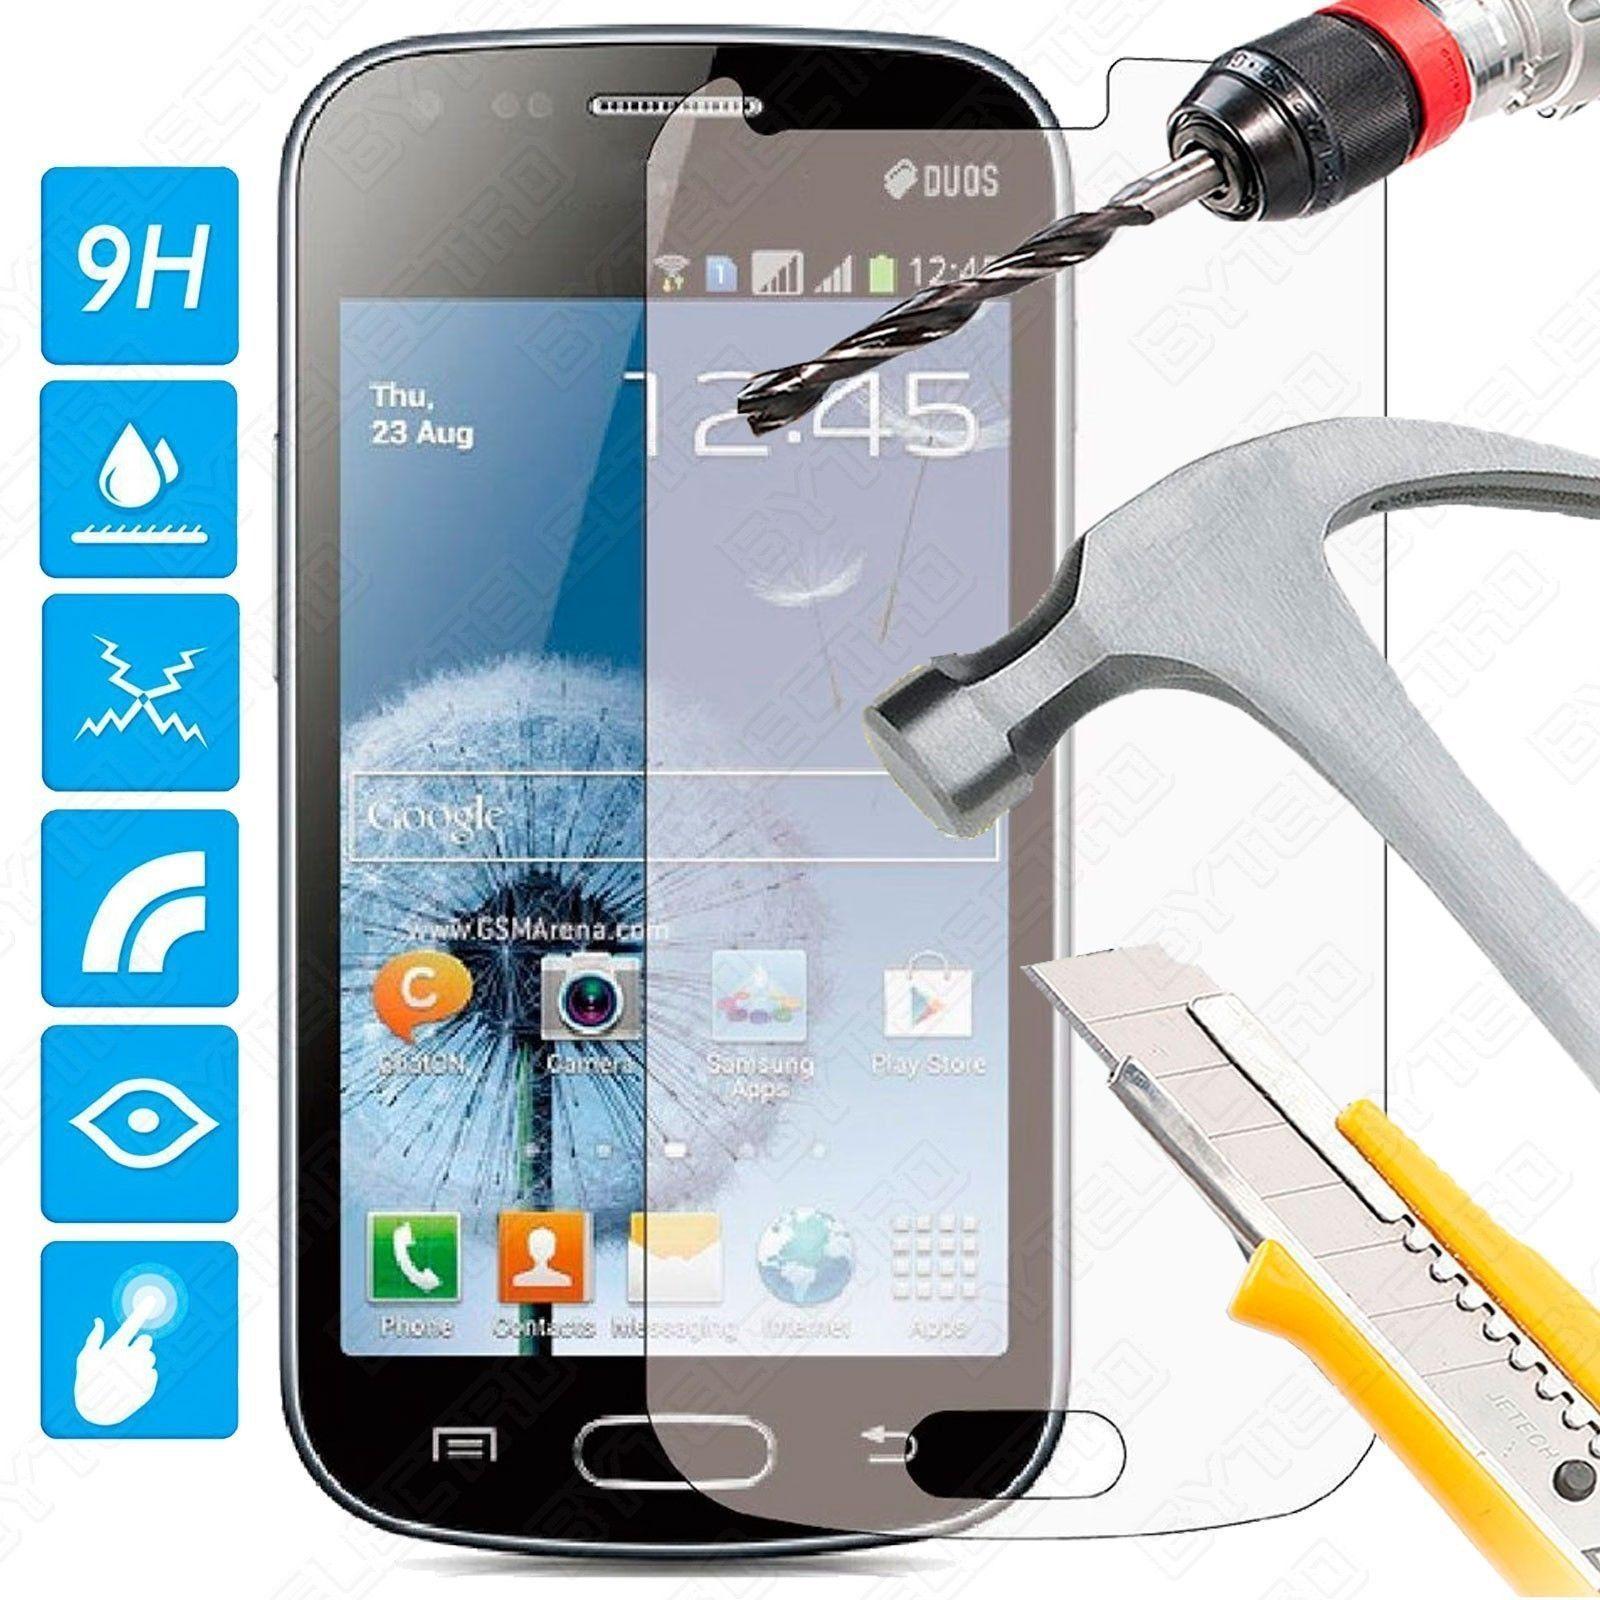 Protector Pantalla CRISTAL TEMPLADO PREMIUM Para Samsung GALAXY TREND S7560 / S DUOS 0